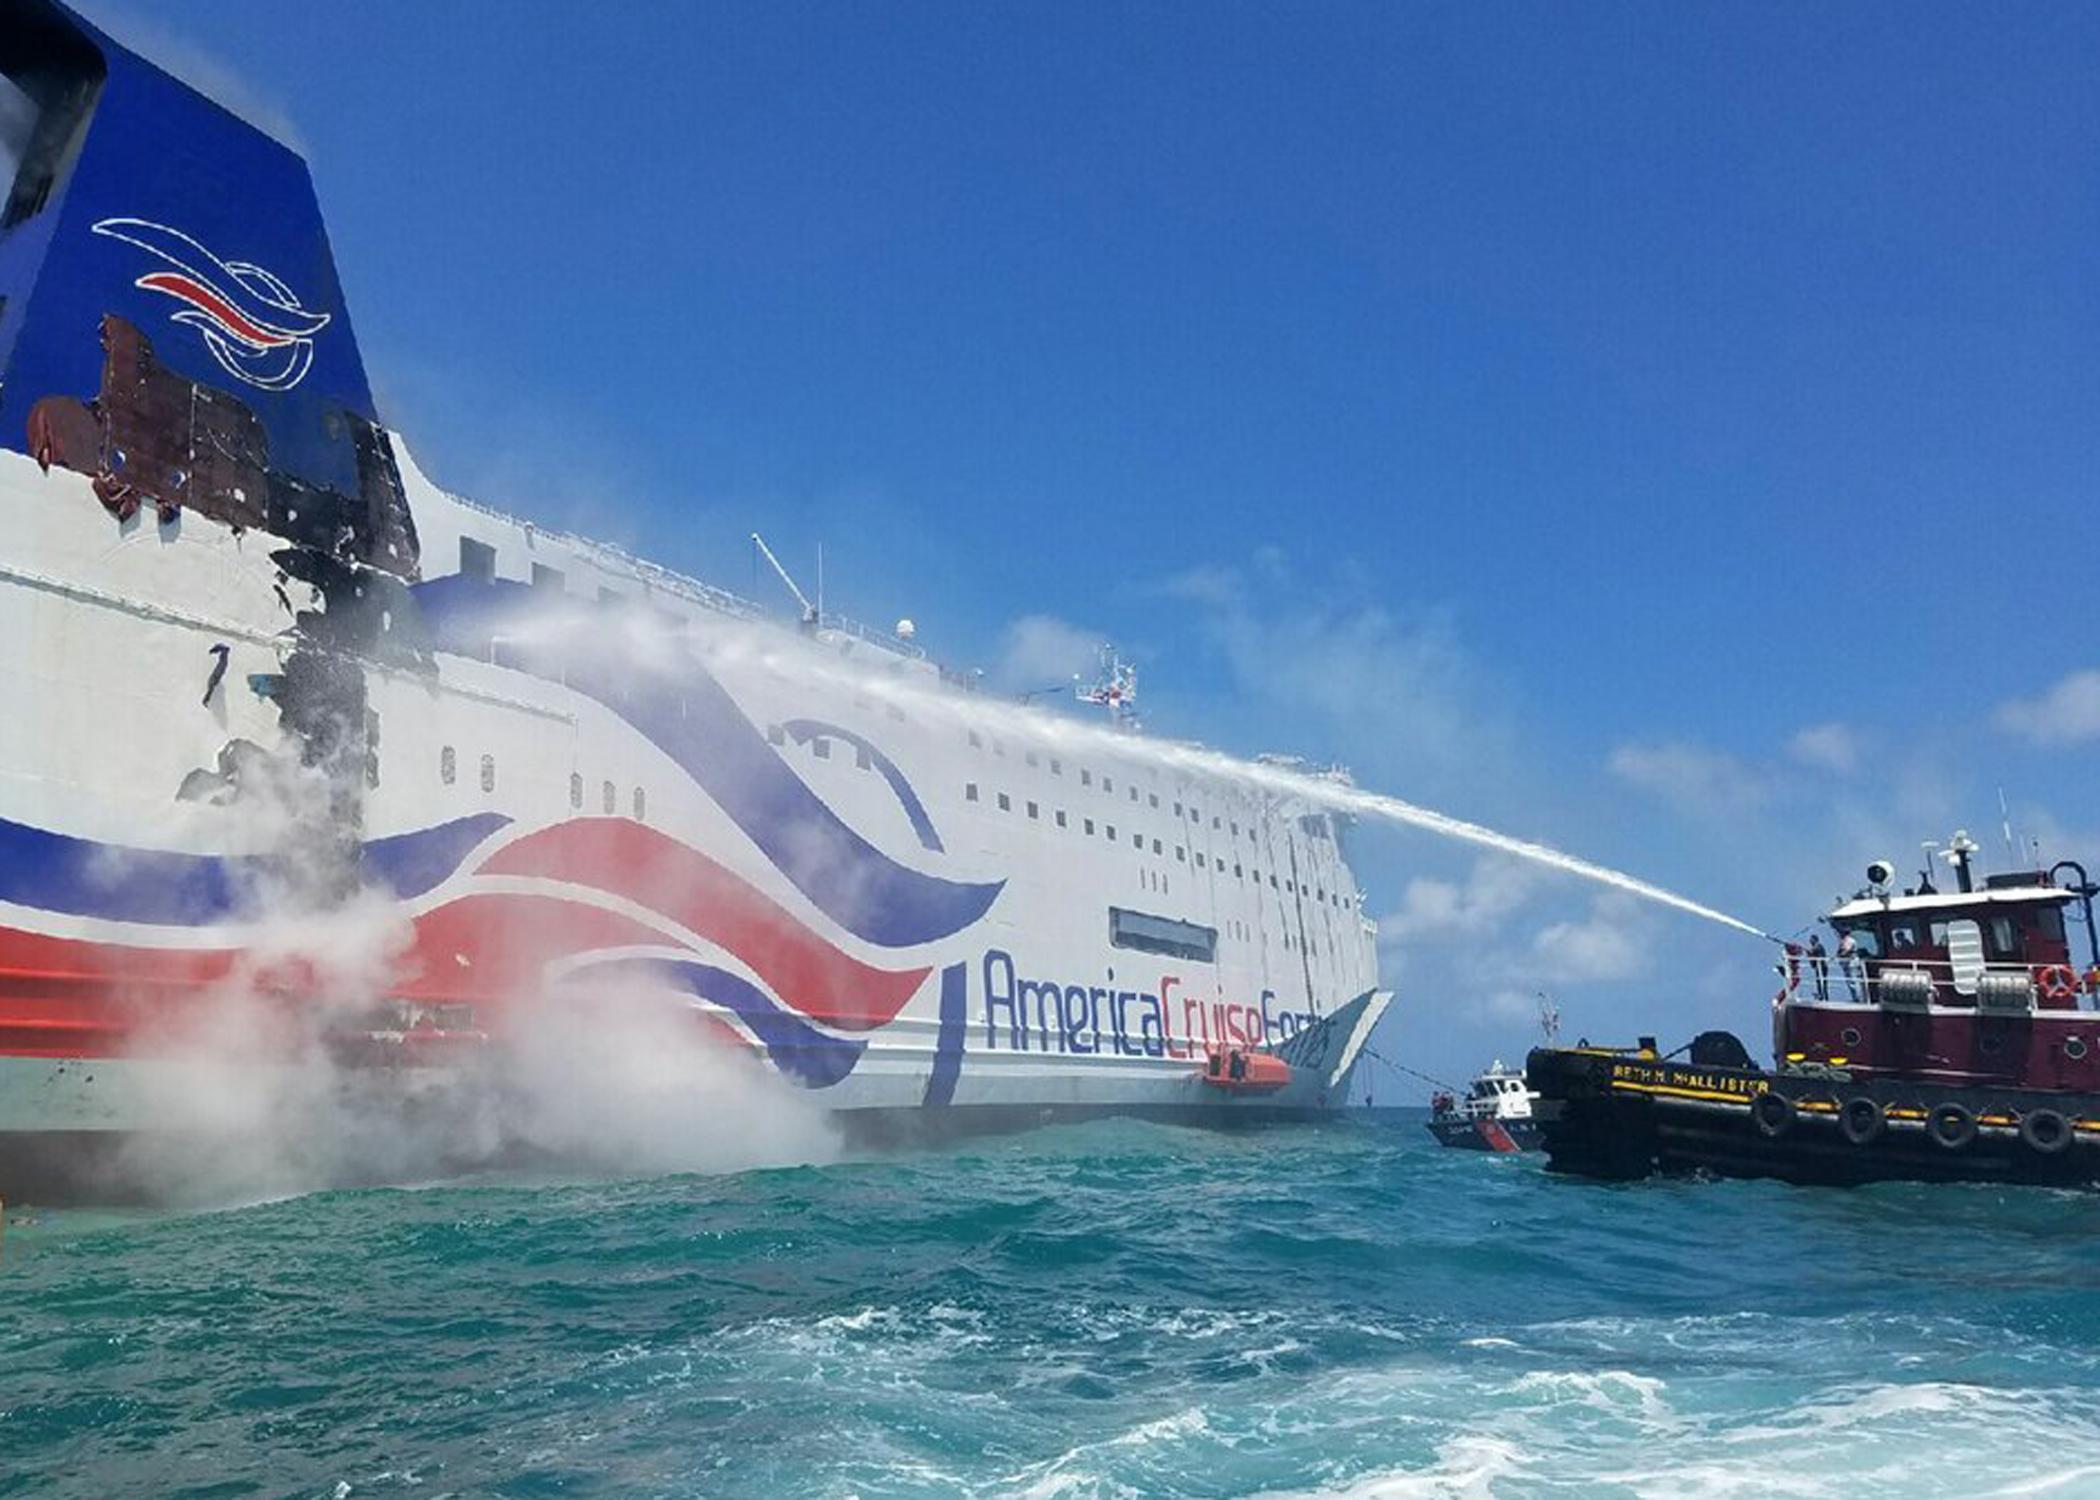 Puerto Rico Passengers On Burning Ship Near Puerto Rico Recall Ordeal